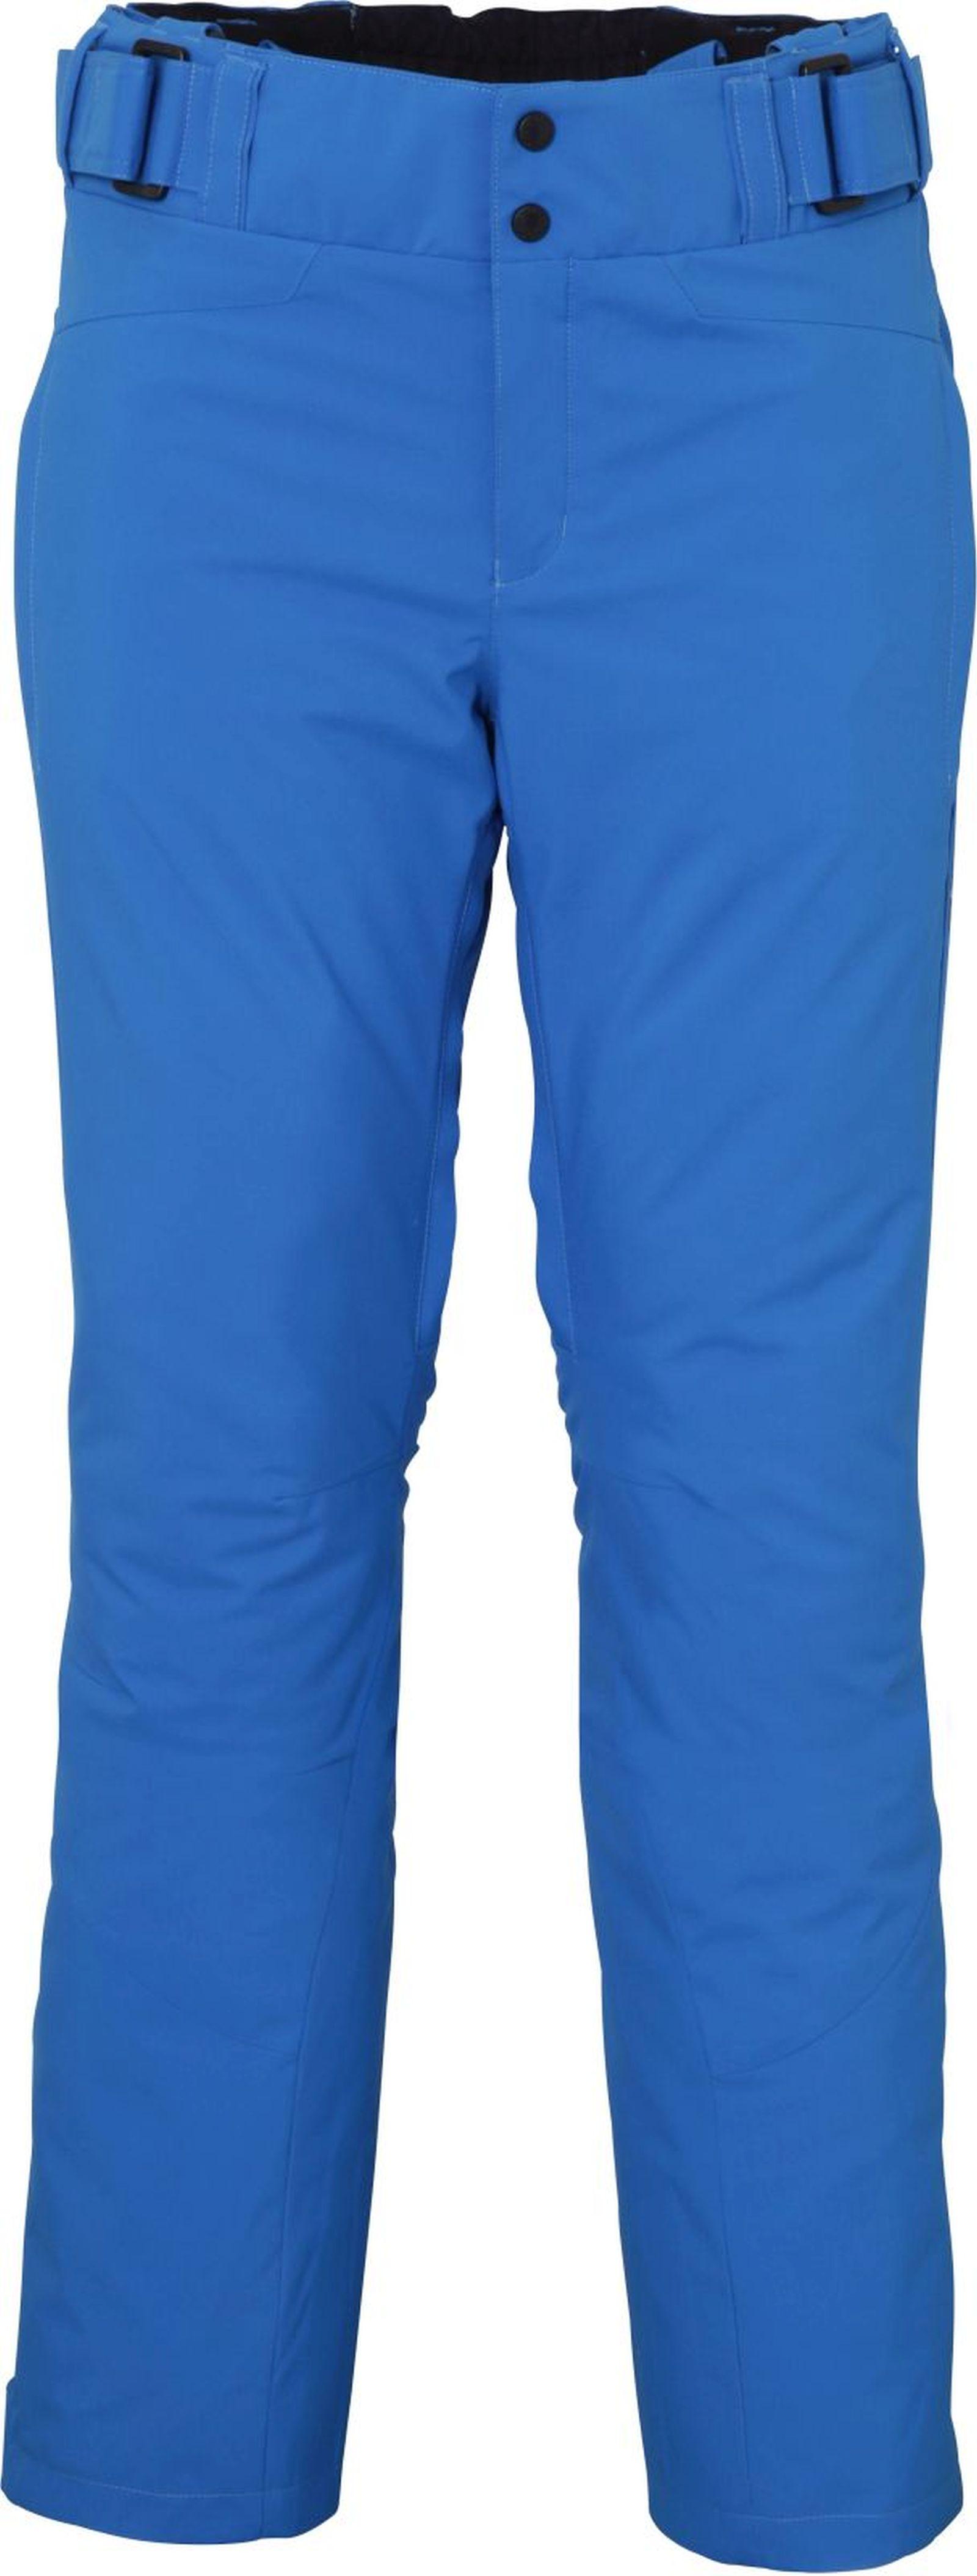 Phenix Arrow Salopette - blue XXL